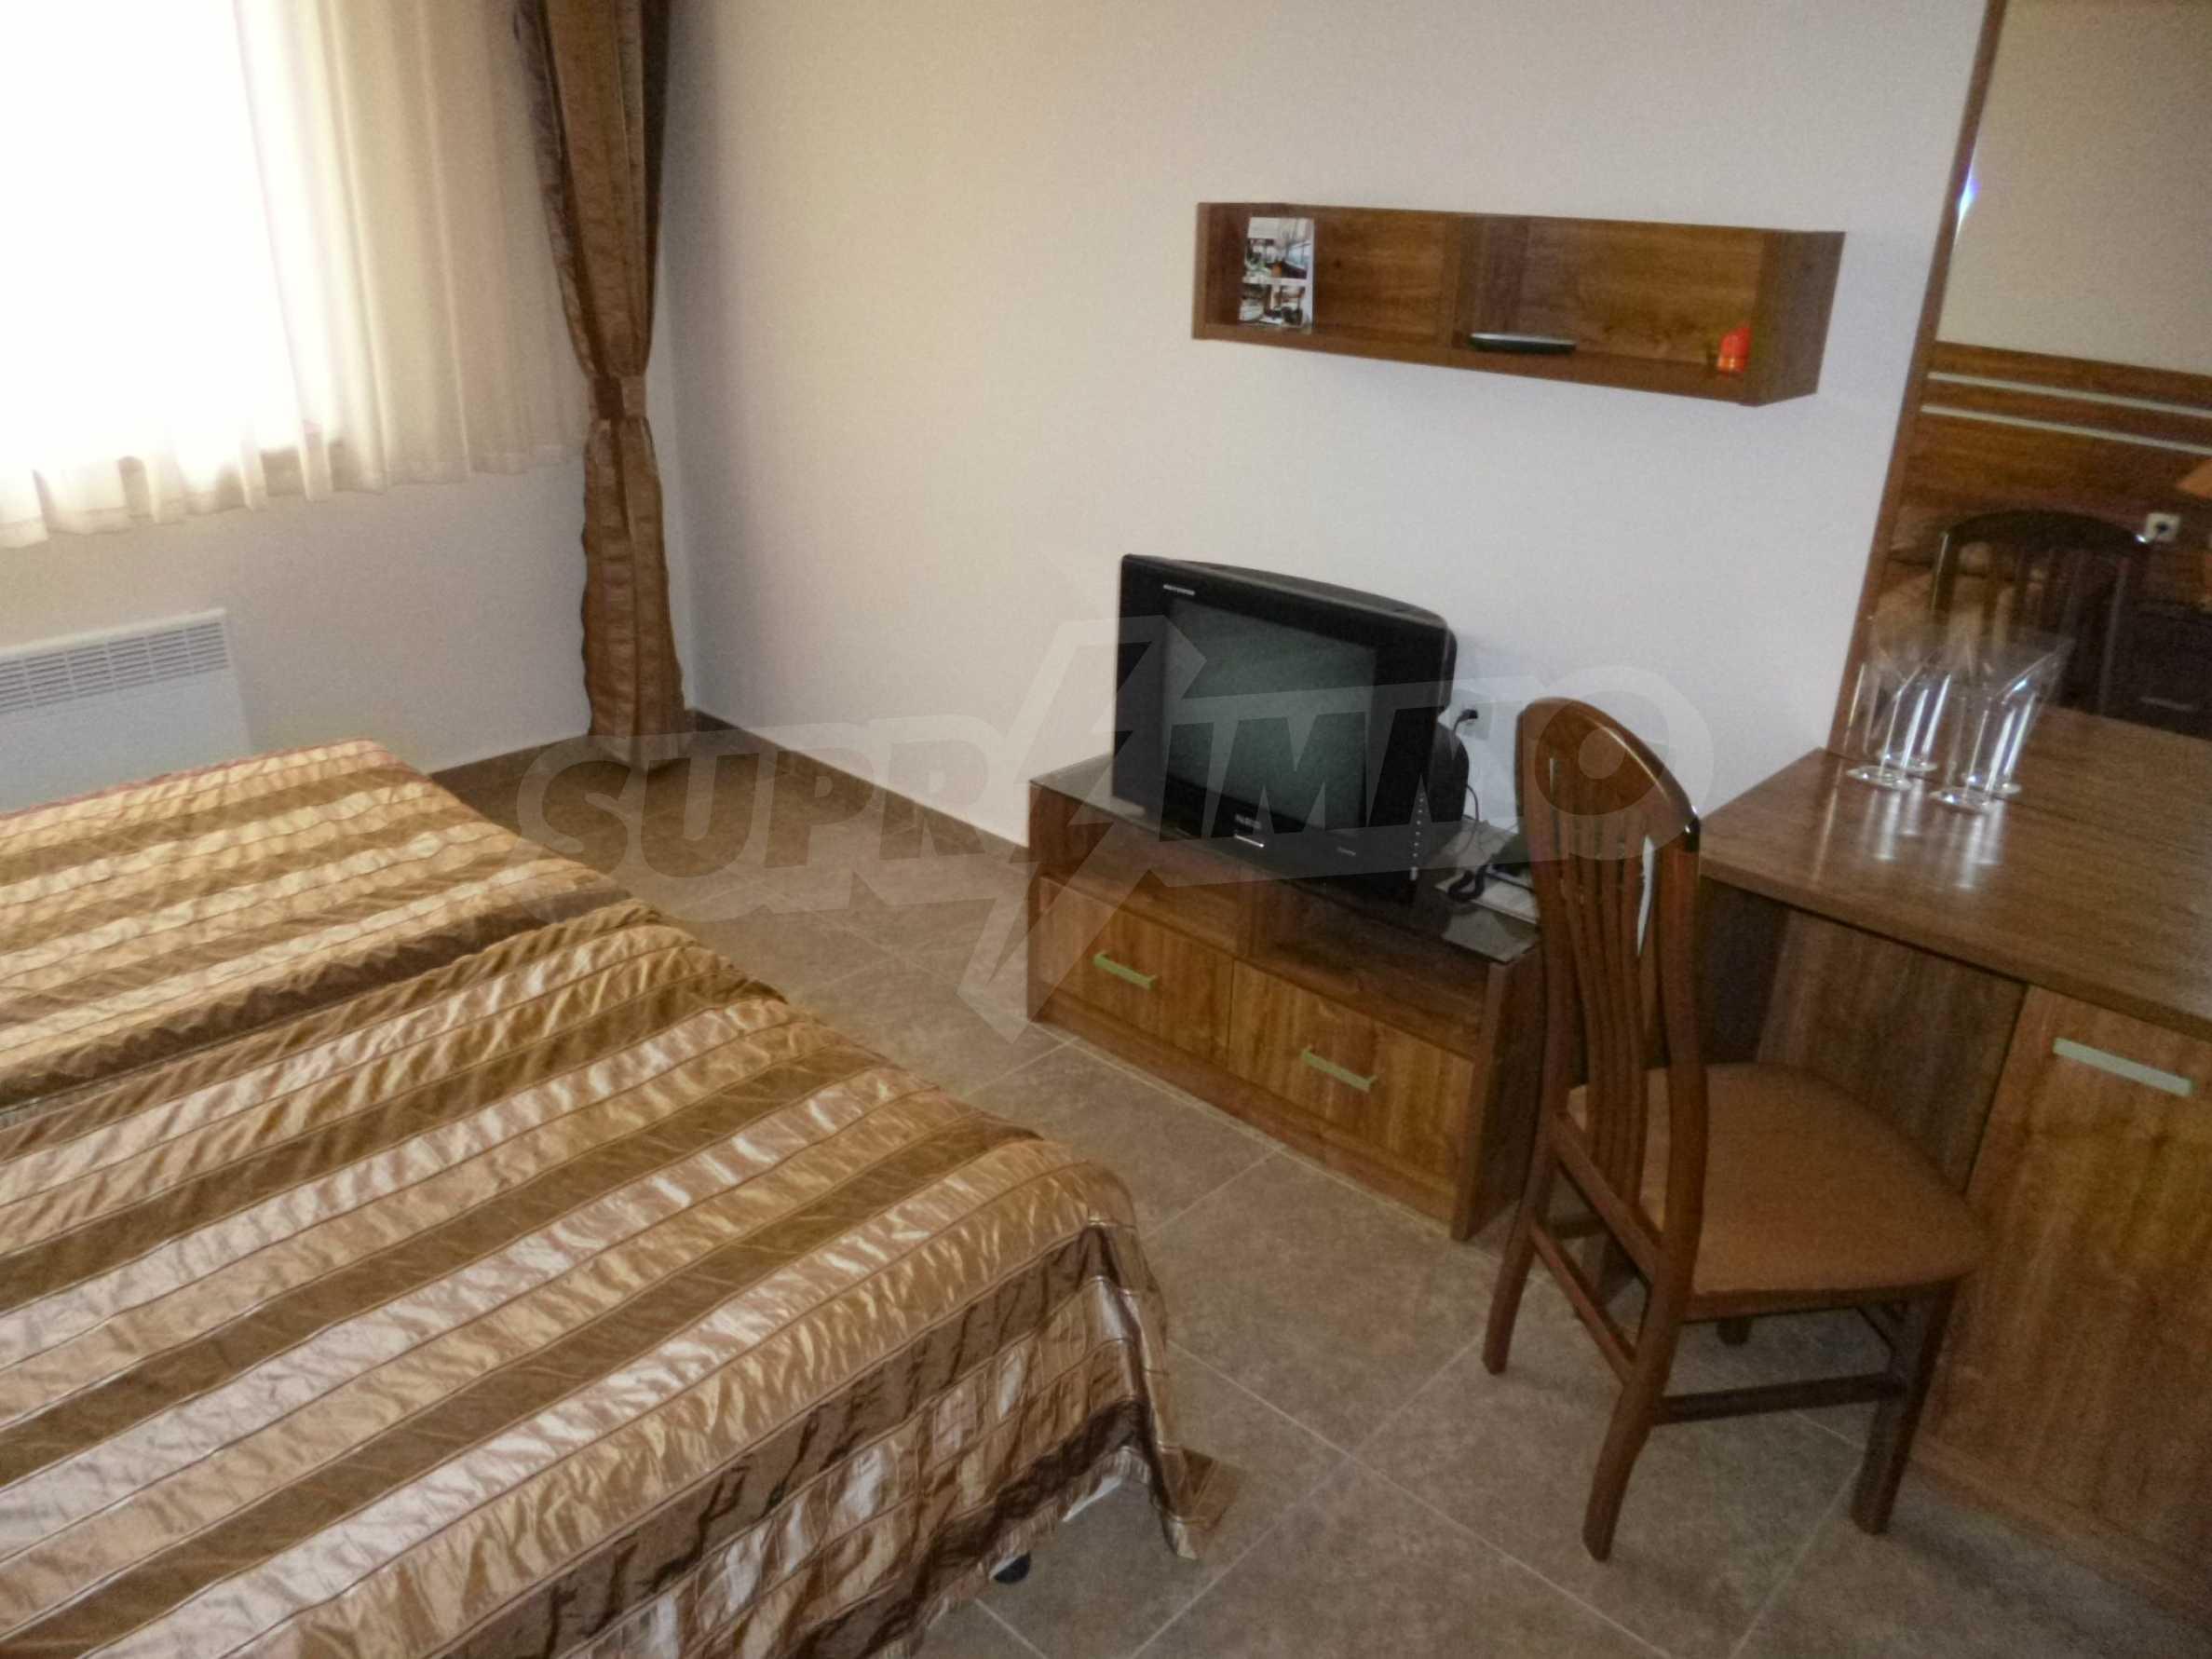 Luxuriös eingerichtetes Studio im Perelik Palace SPA Hotel 3